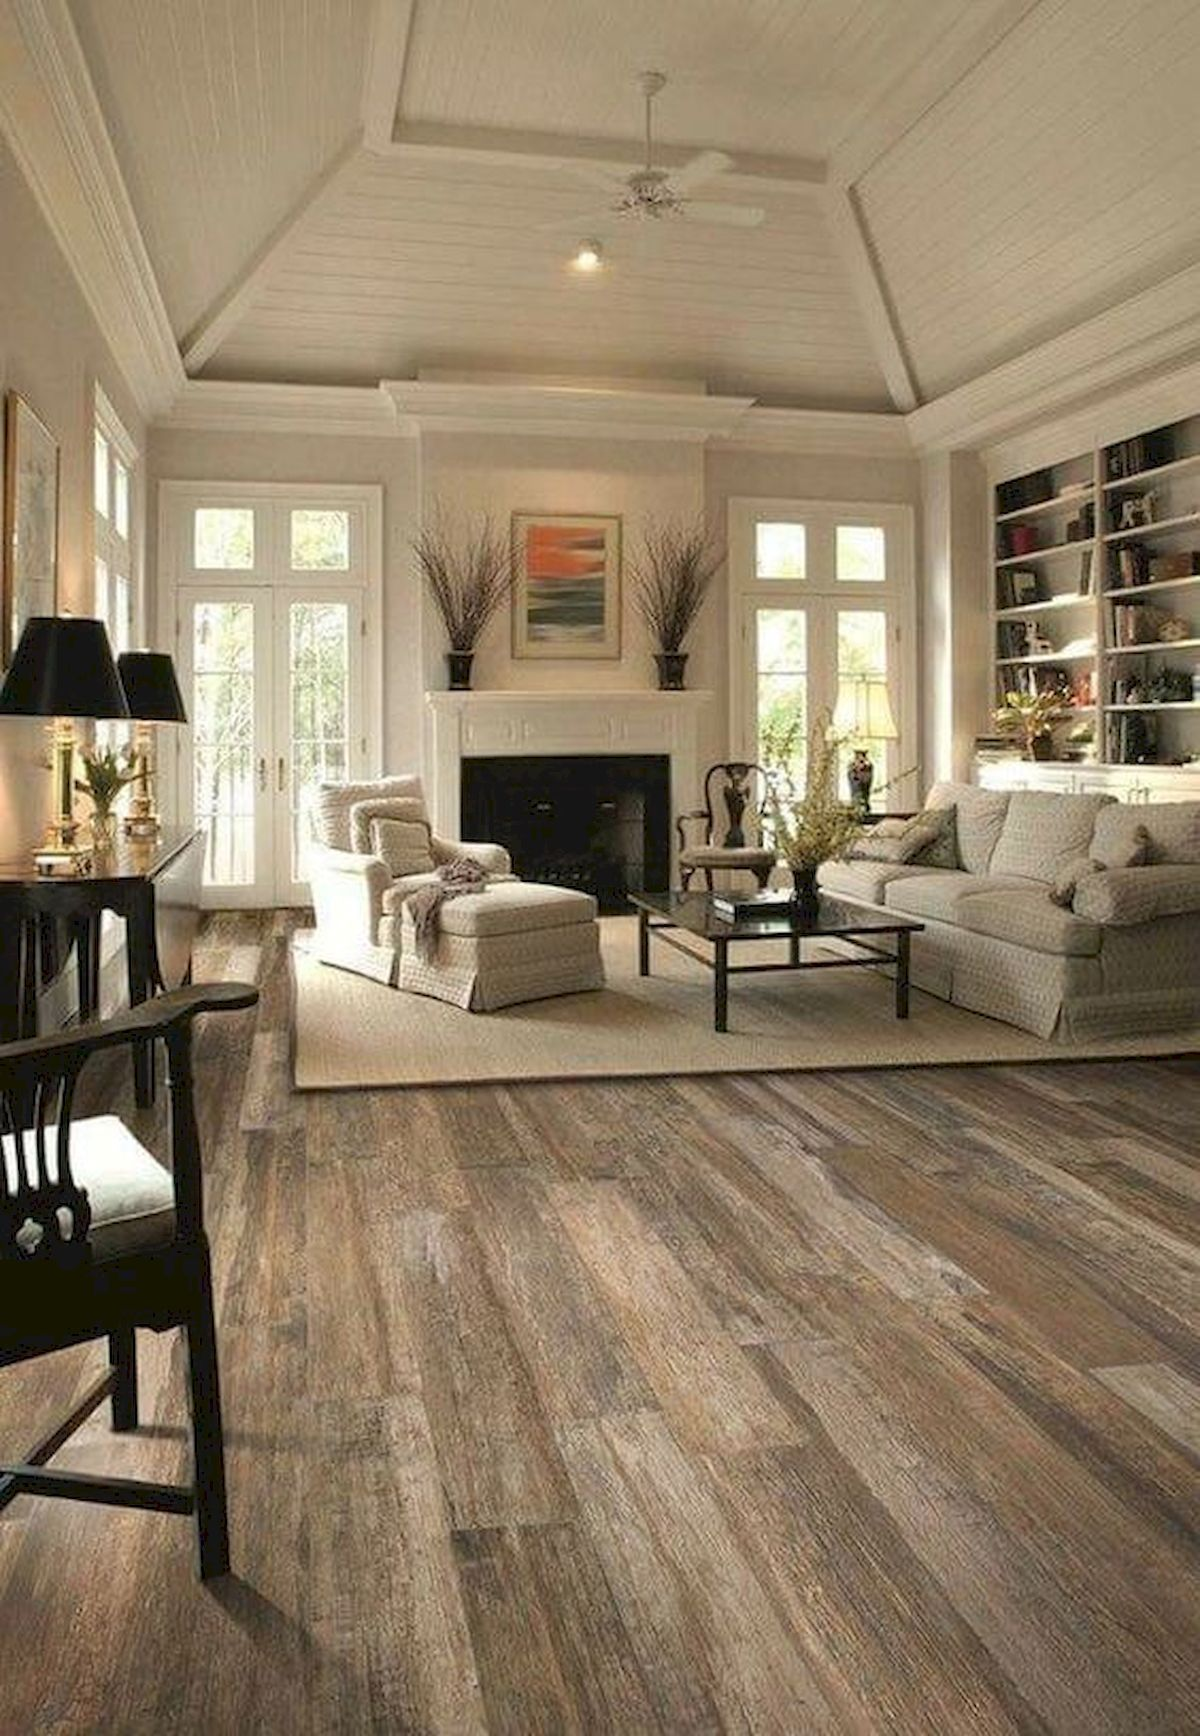 30 Stunning Farmhouse Living Room Decor Ideas images